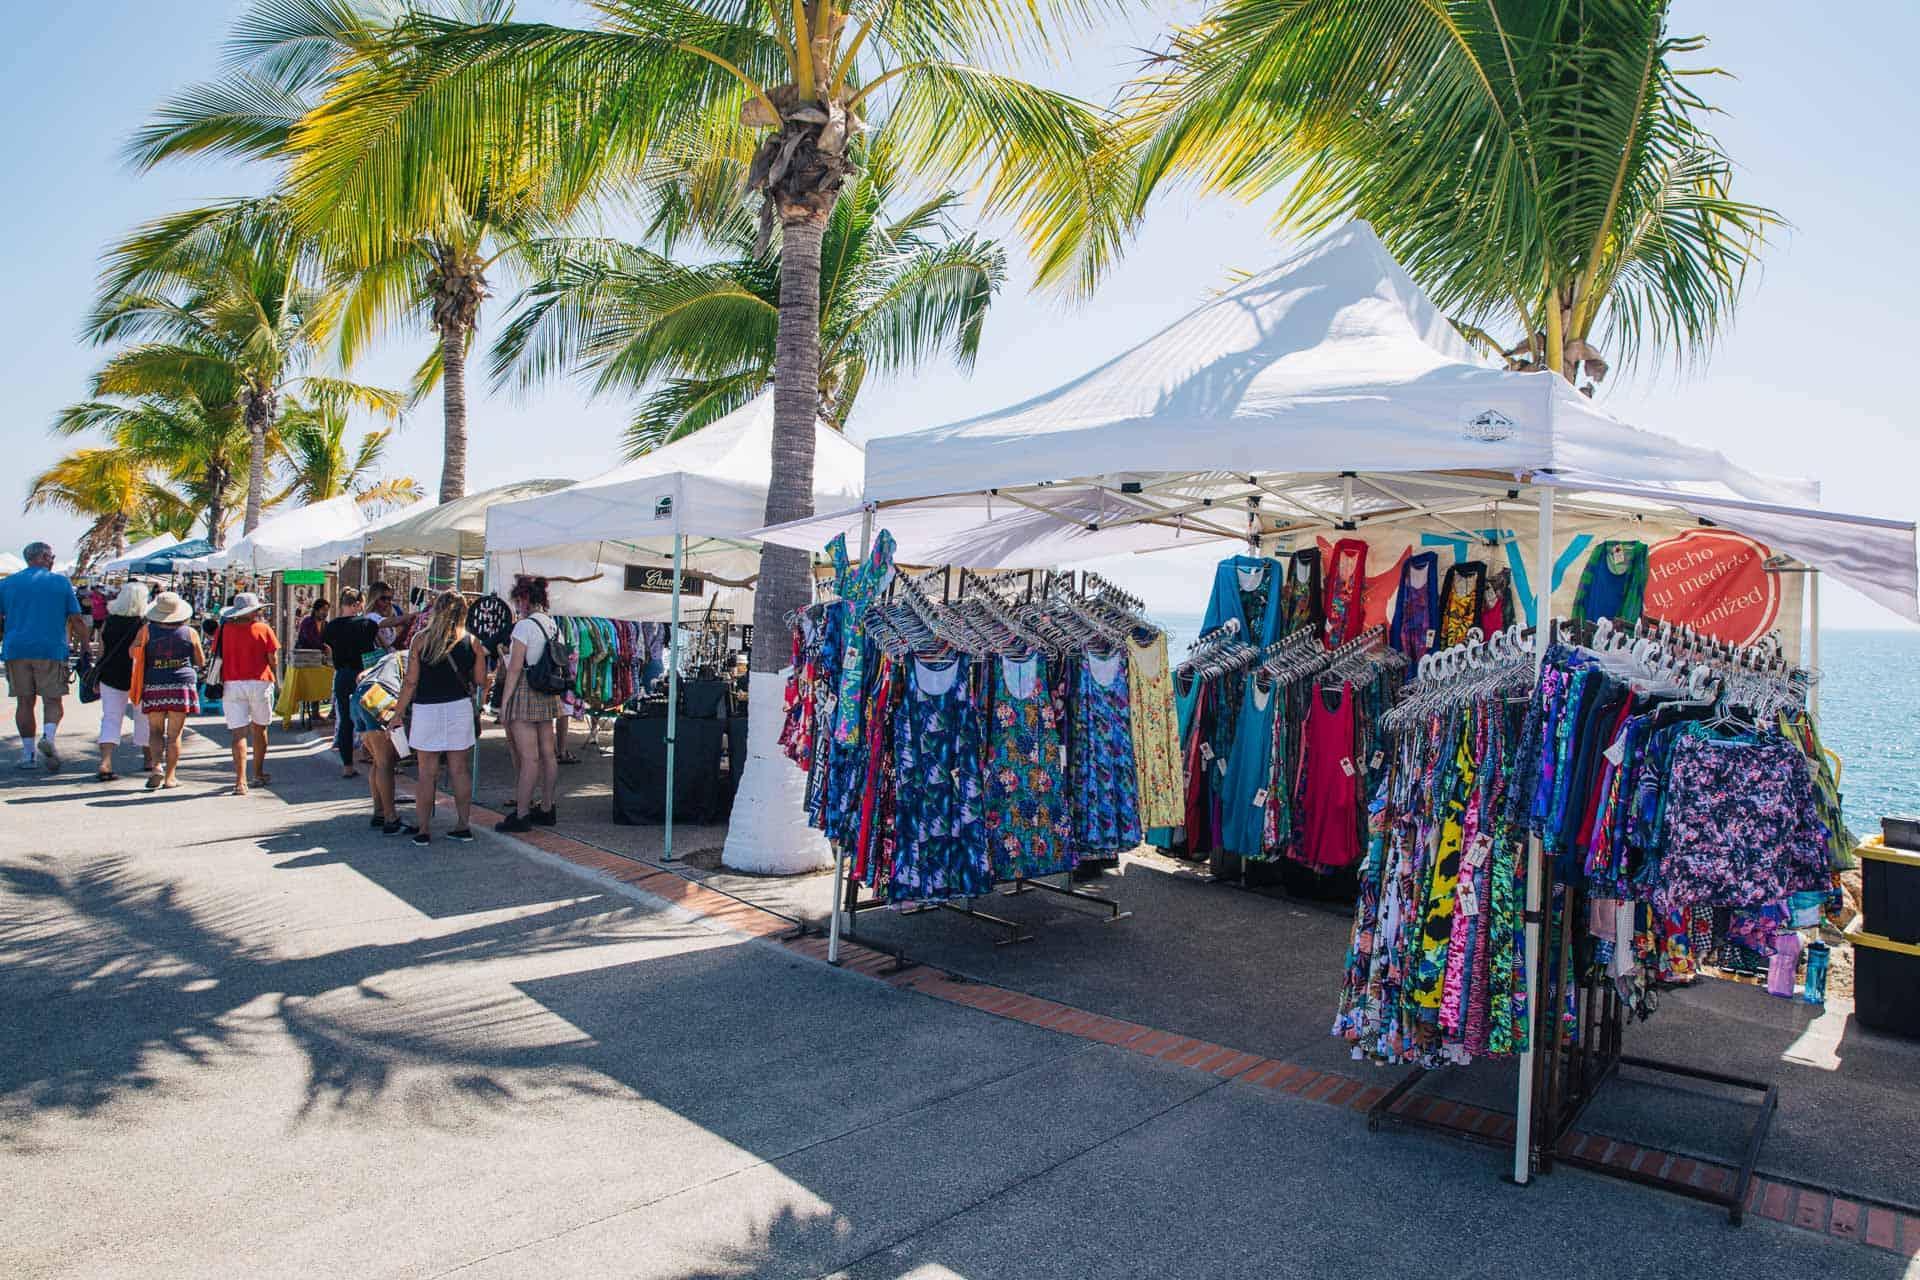 things to do in sayulita, sayulita mexico, what to do in sayulita, sayulita, la cruz market